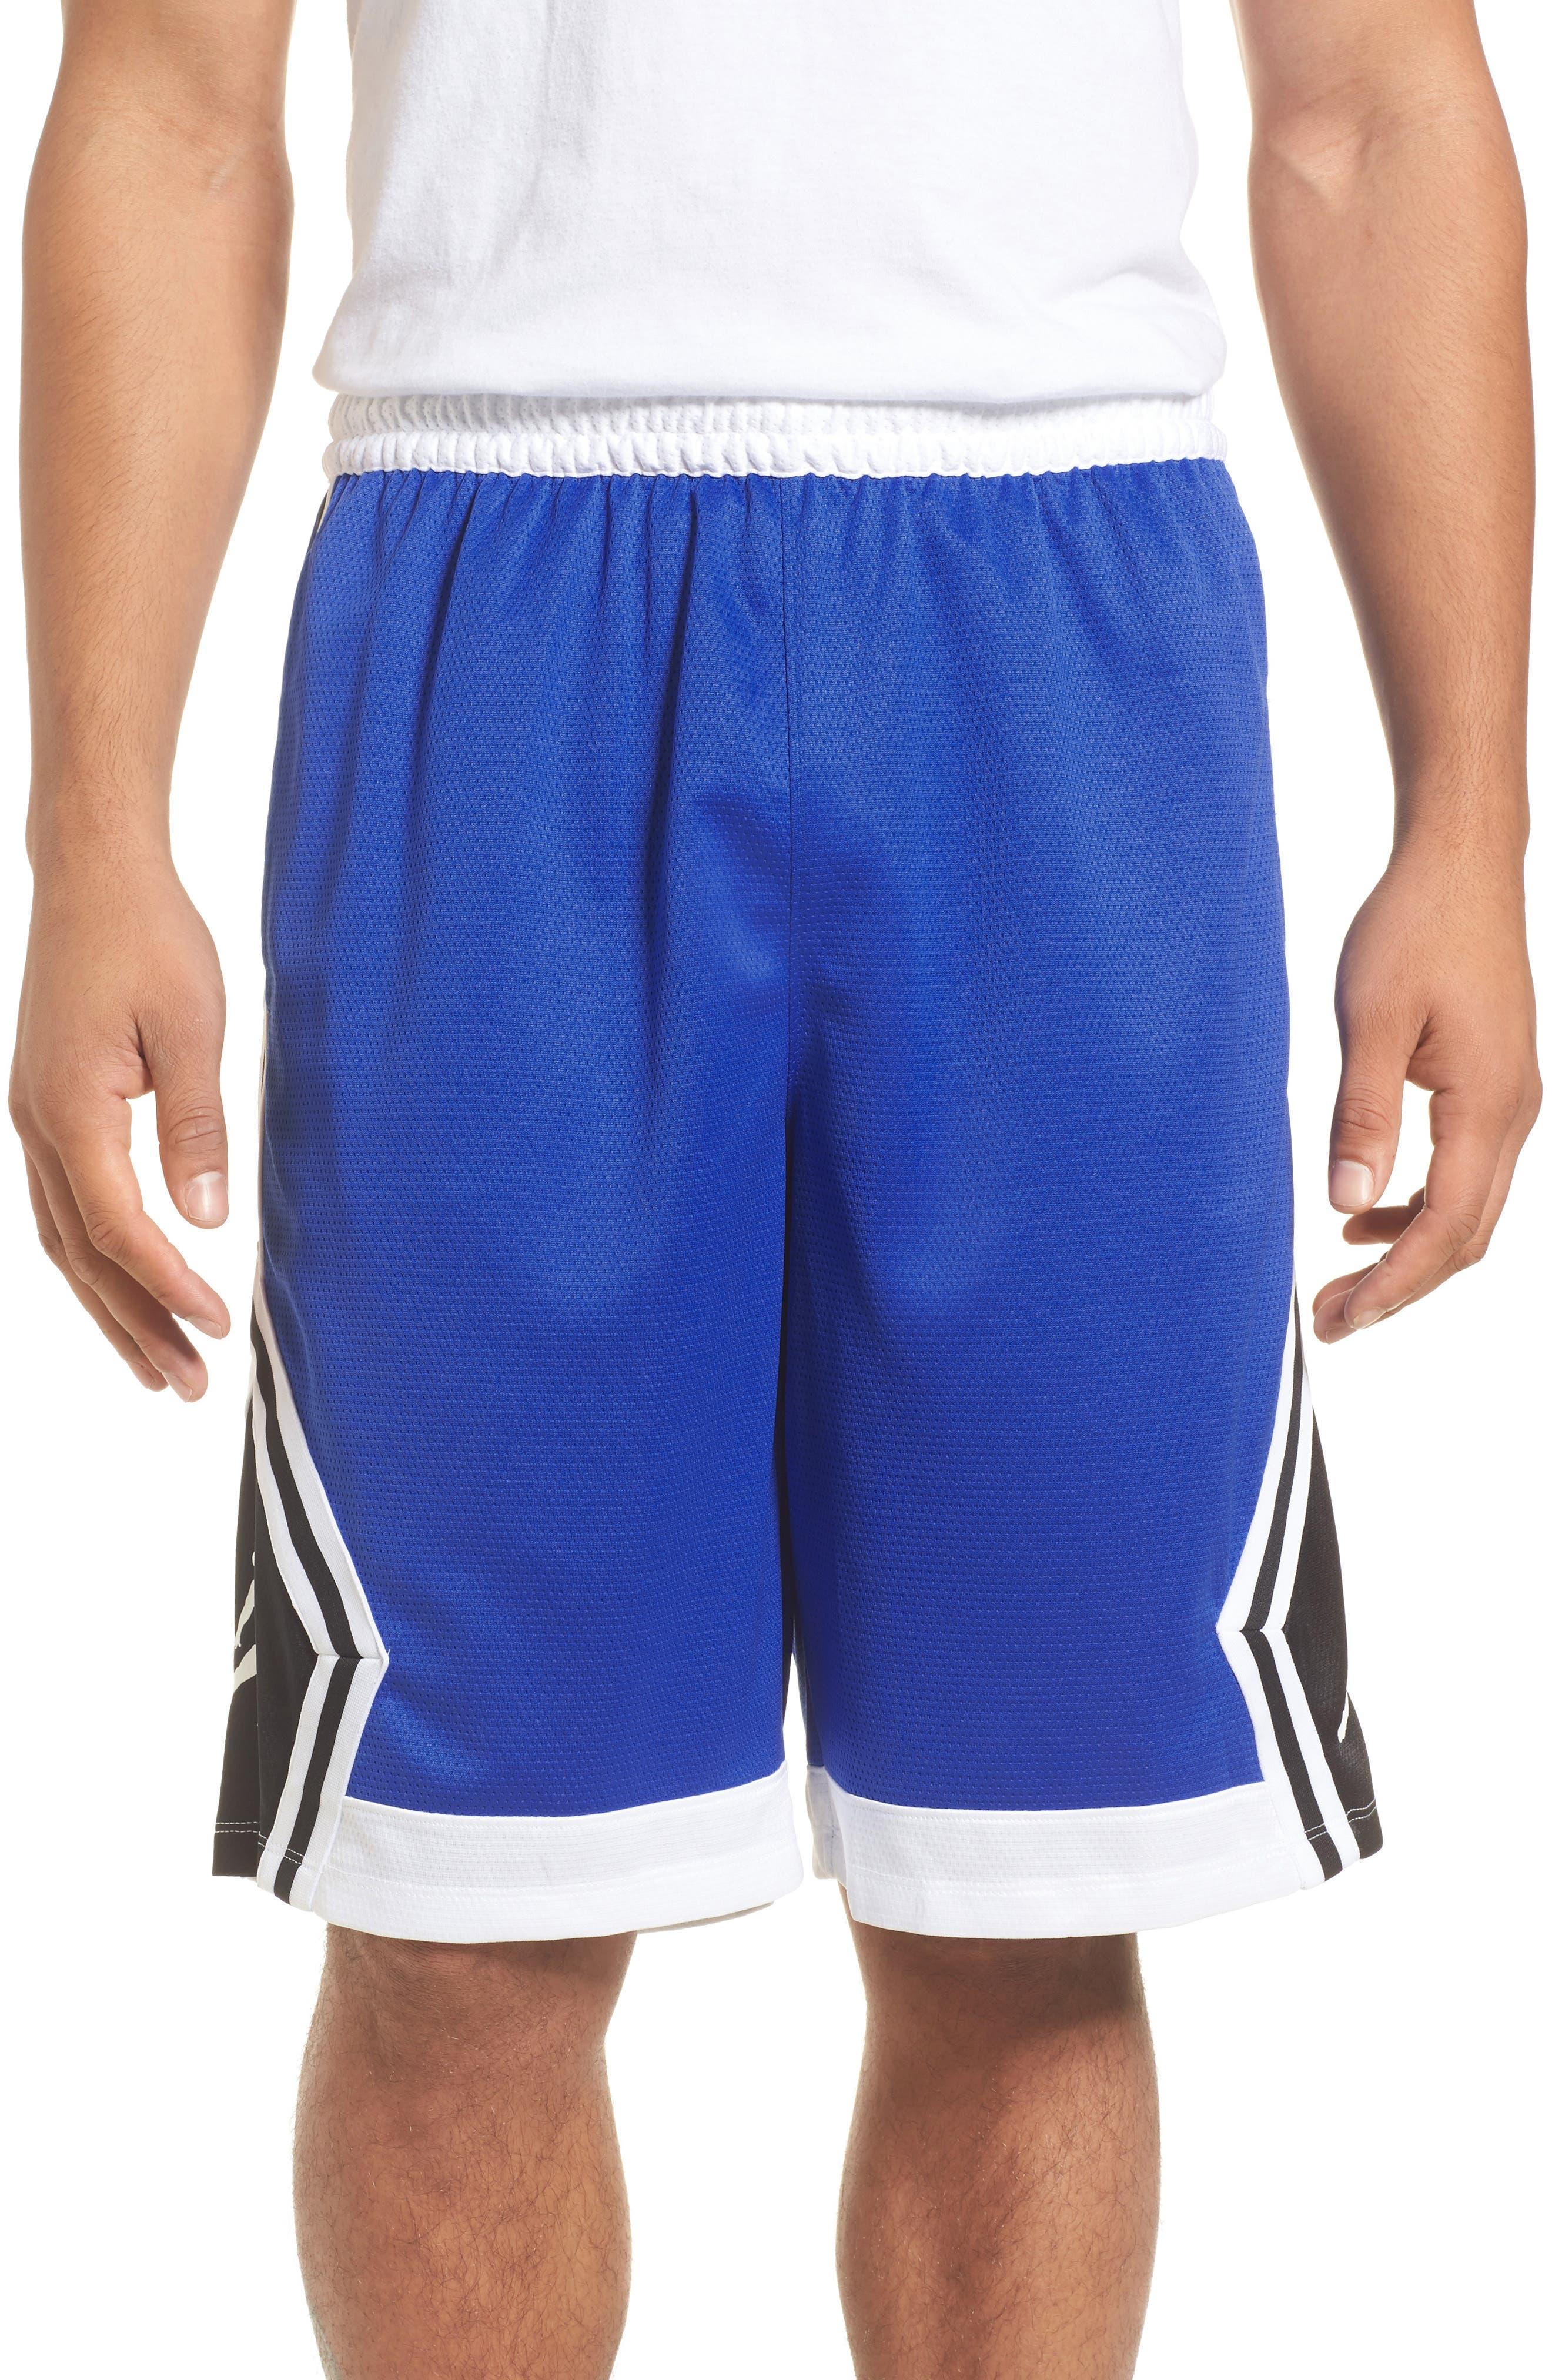 Sportswear Rise Diamond Shorts,                             Main thumbnail 1, color,                             Hyper Royal/ White/ Black